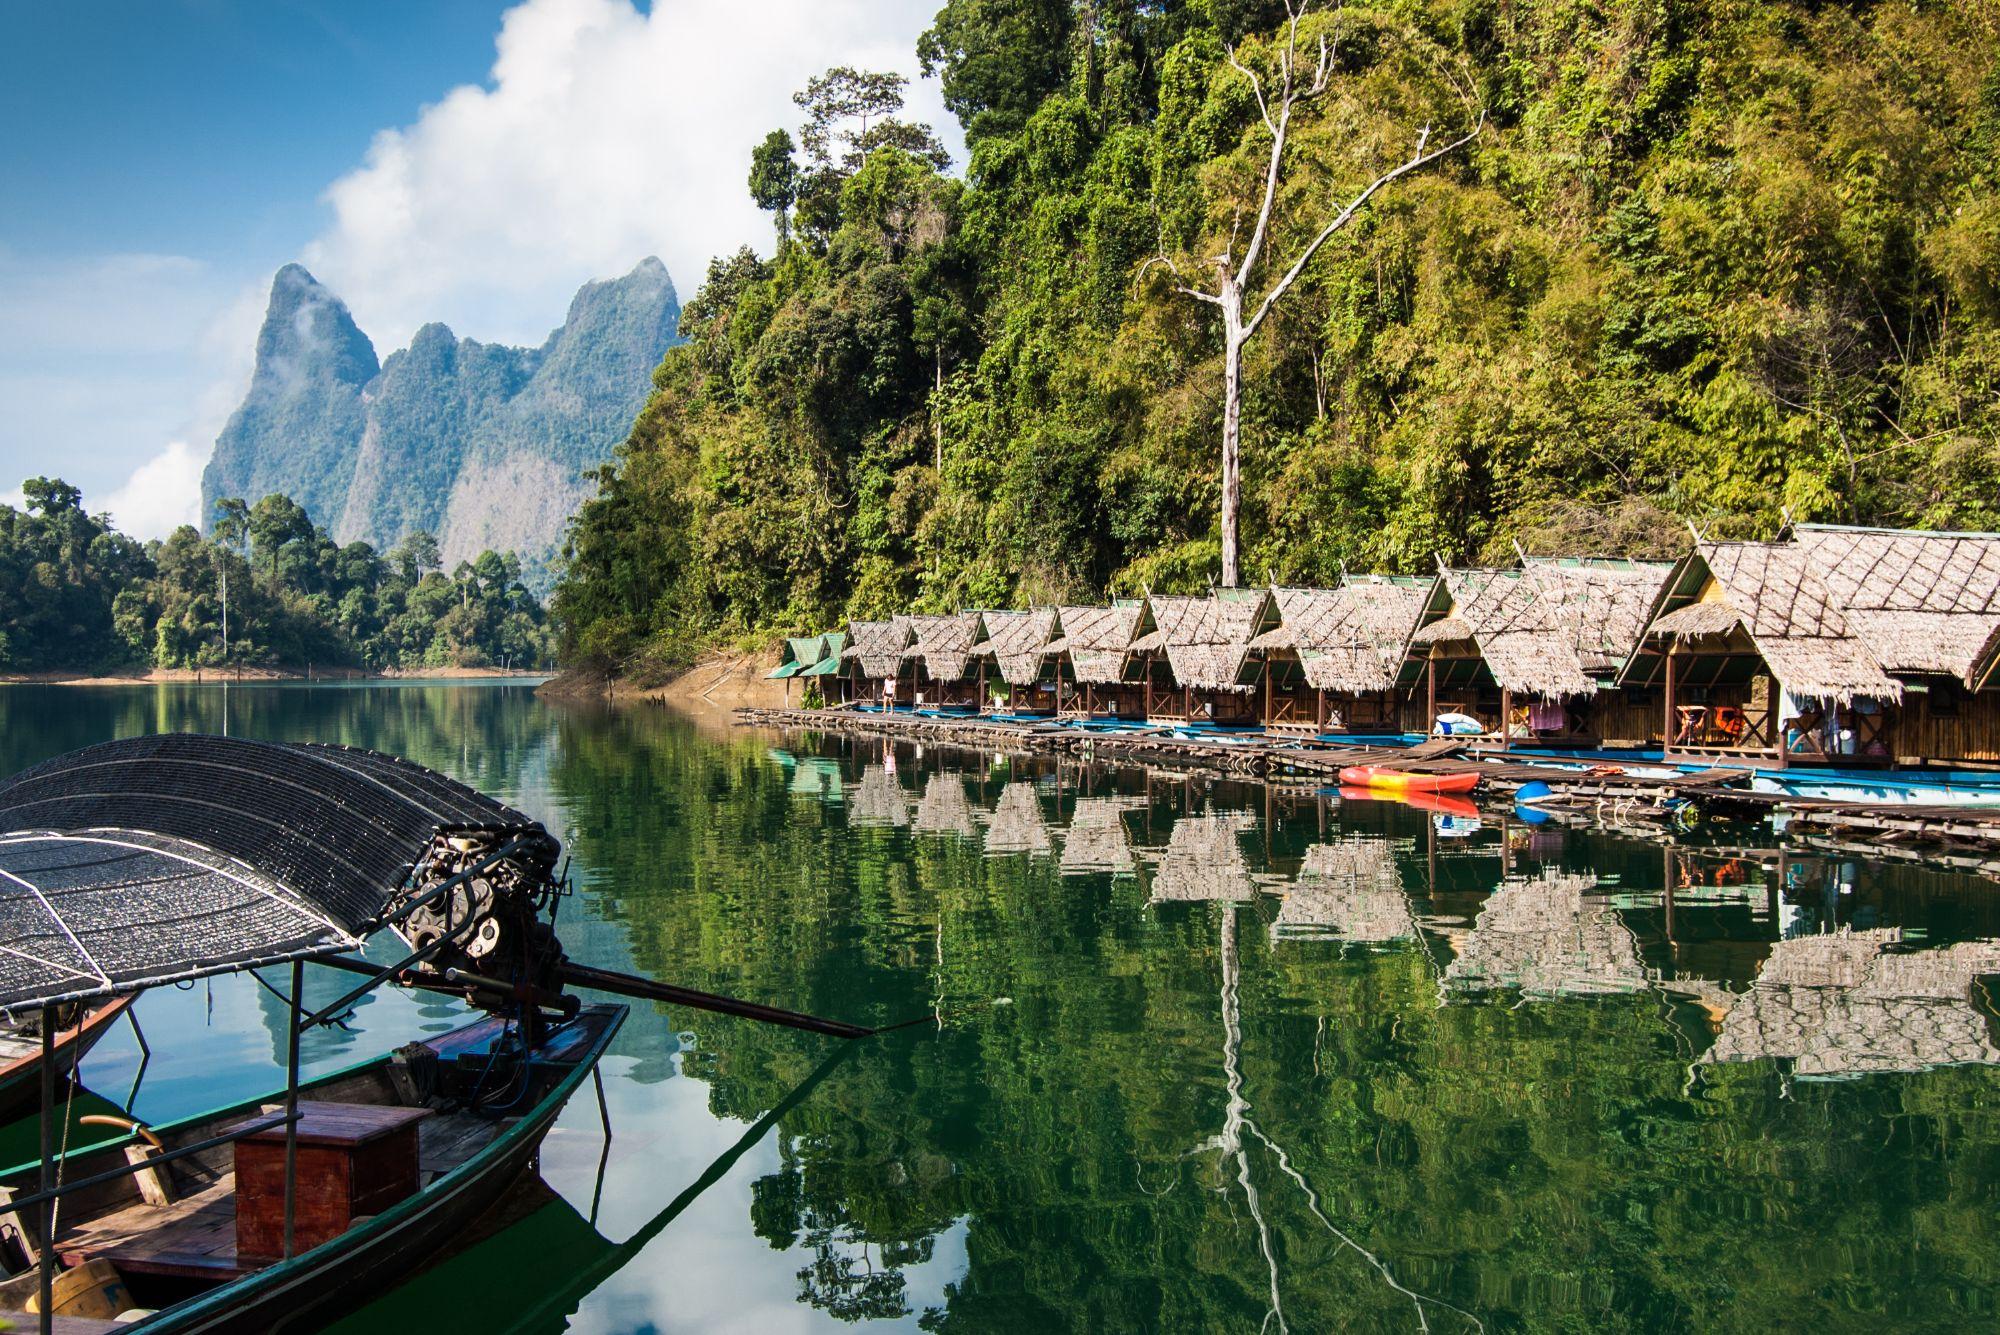 Thailand Khao Sok National Park Cheow Lan Lake rivier drijvende huizen